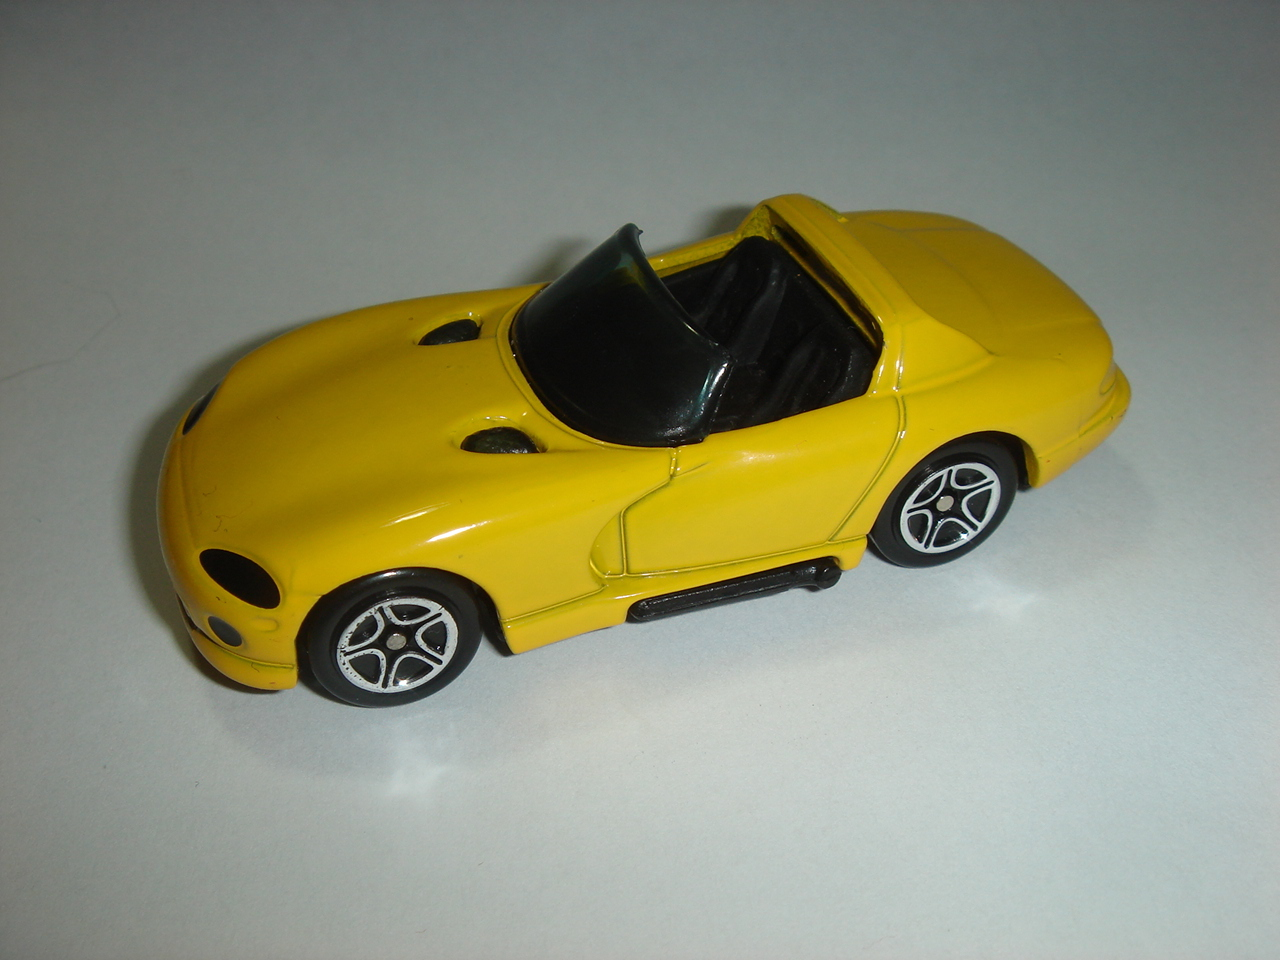 MBX Dodge Viper RT 10